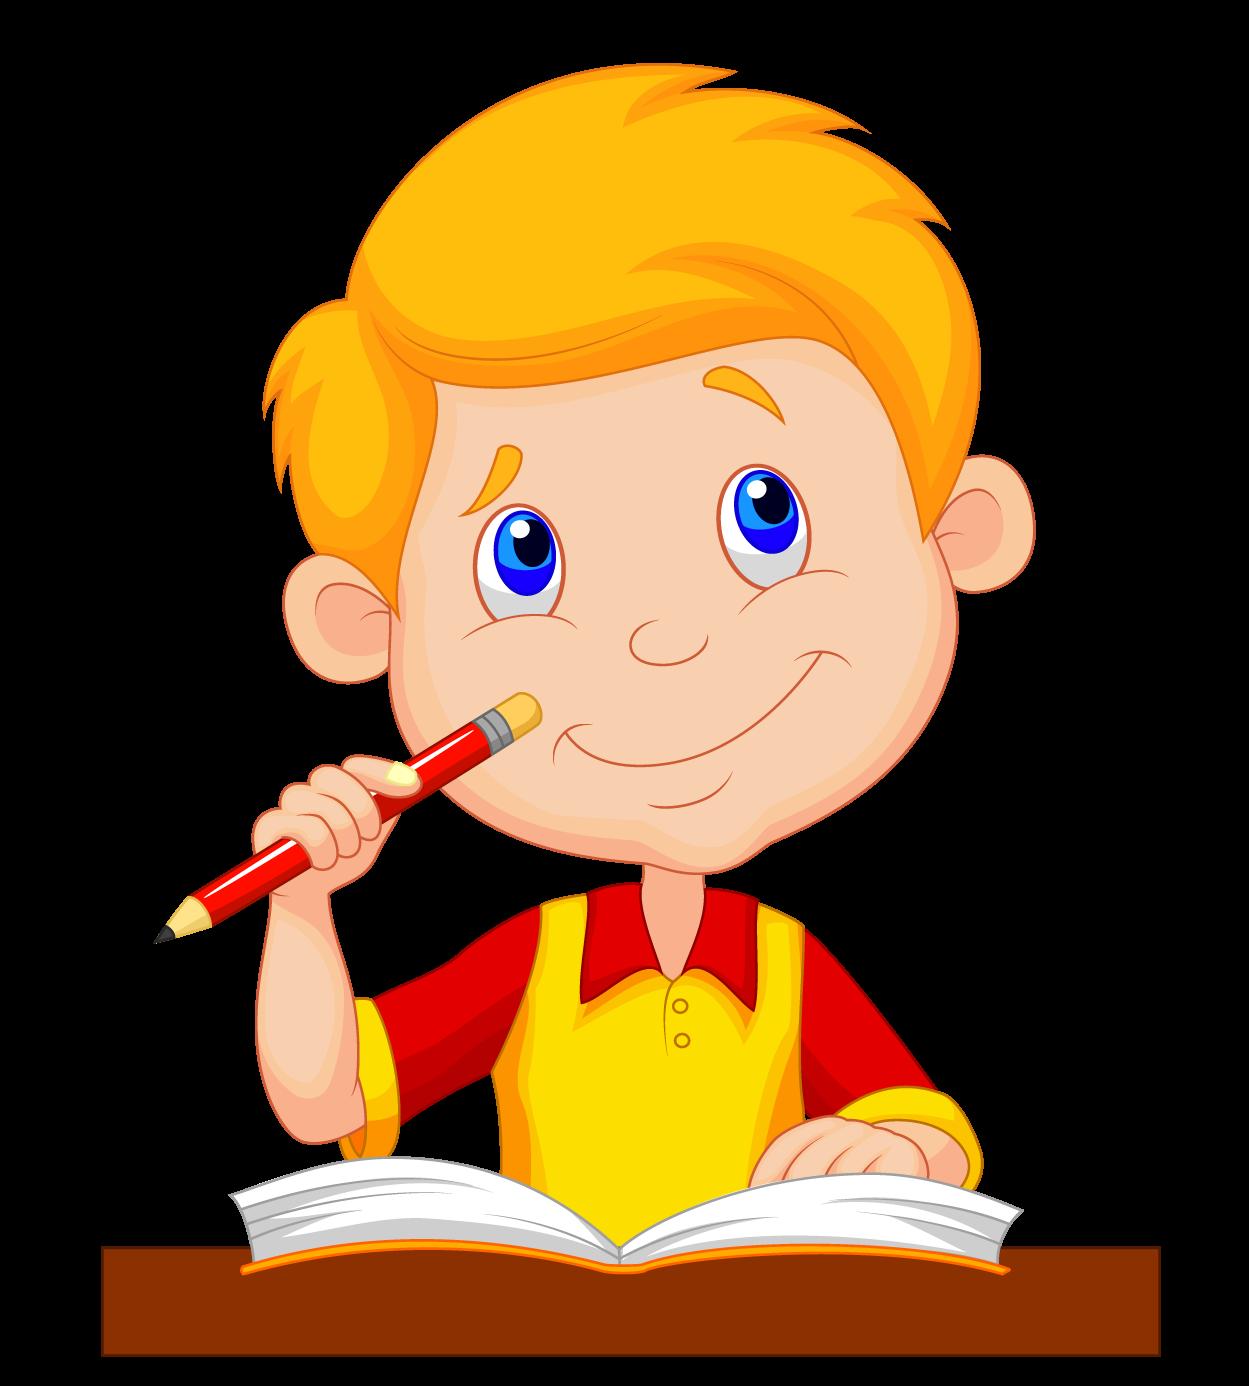 Cartoon child school children. Study clipart drawing